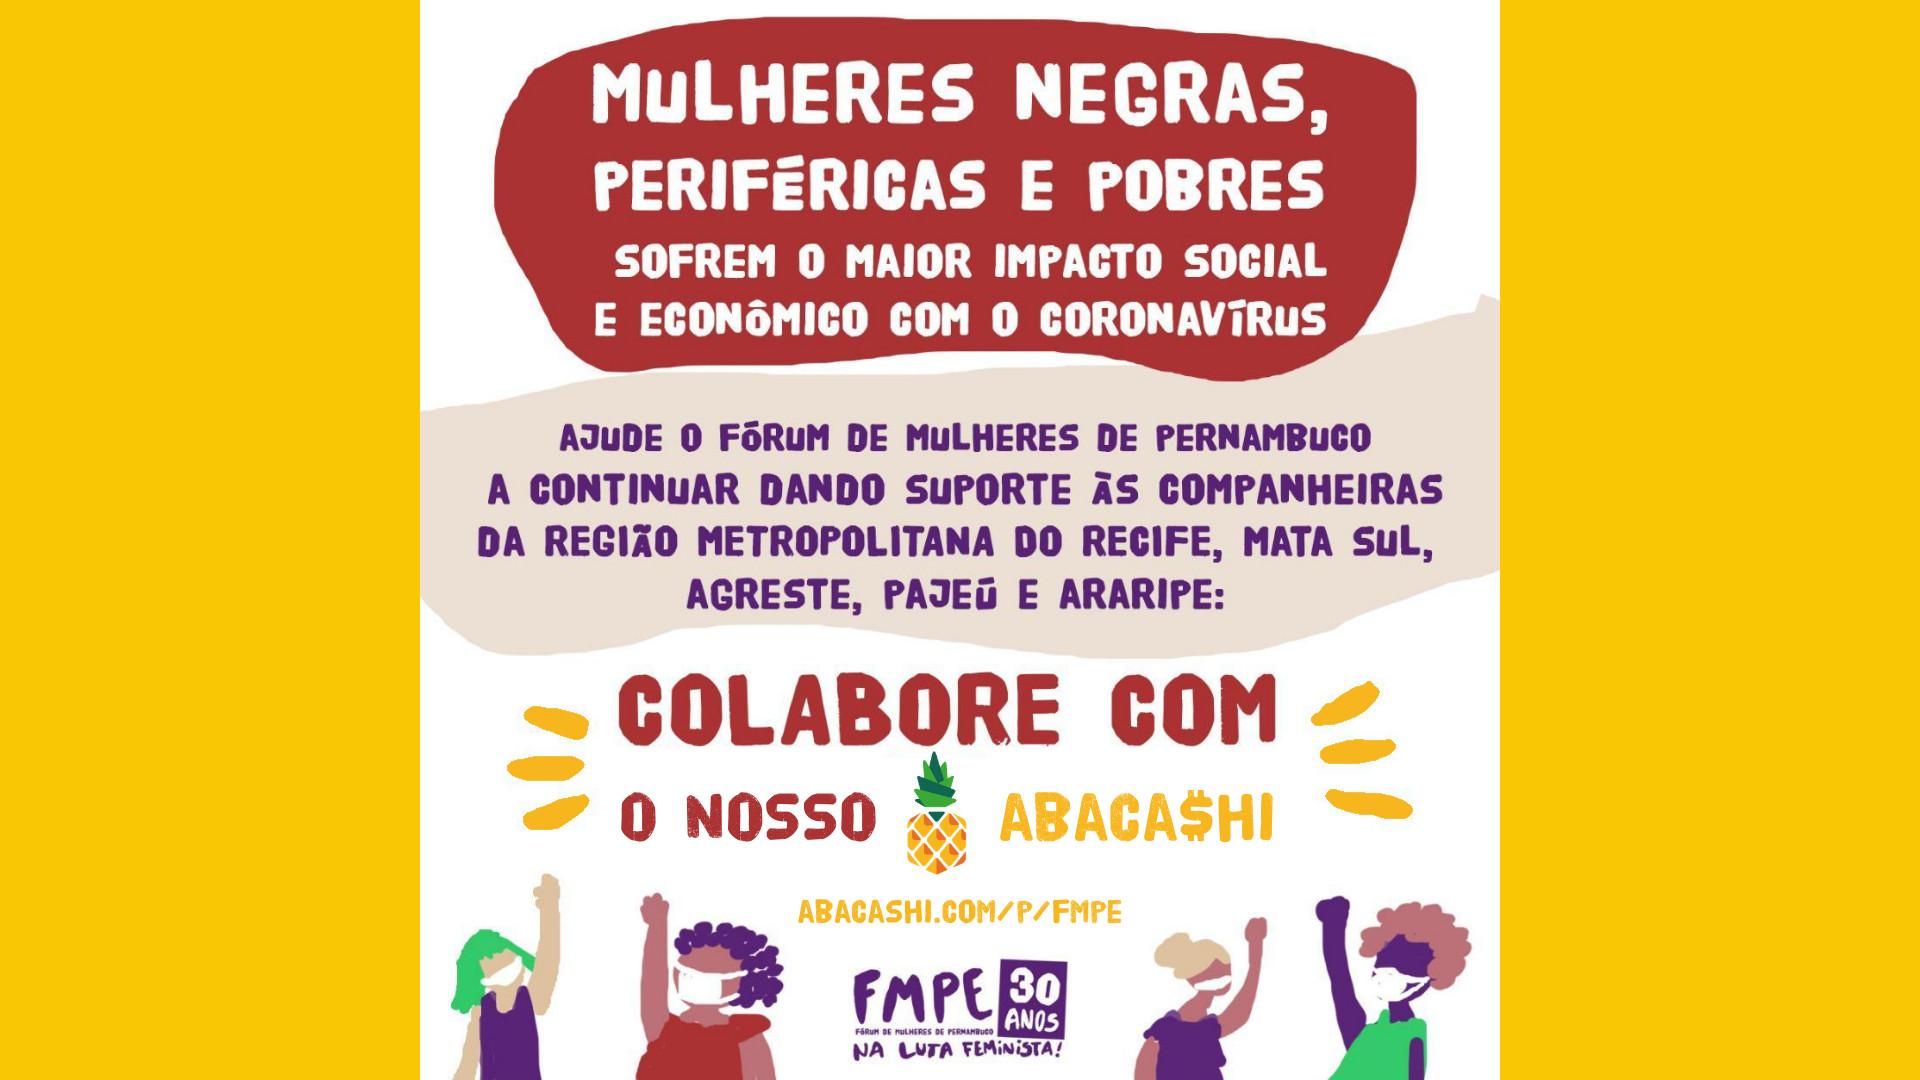 Fórum de Mulheres de Pernambuco arrecada recursos para Rede de Solidariedade às mulheres